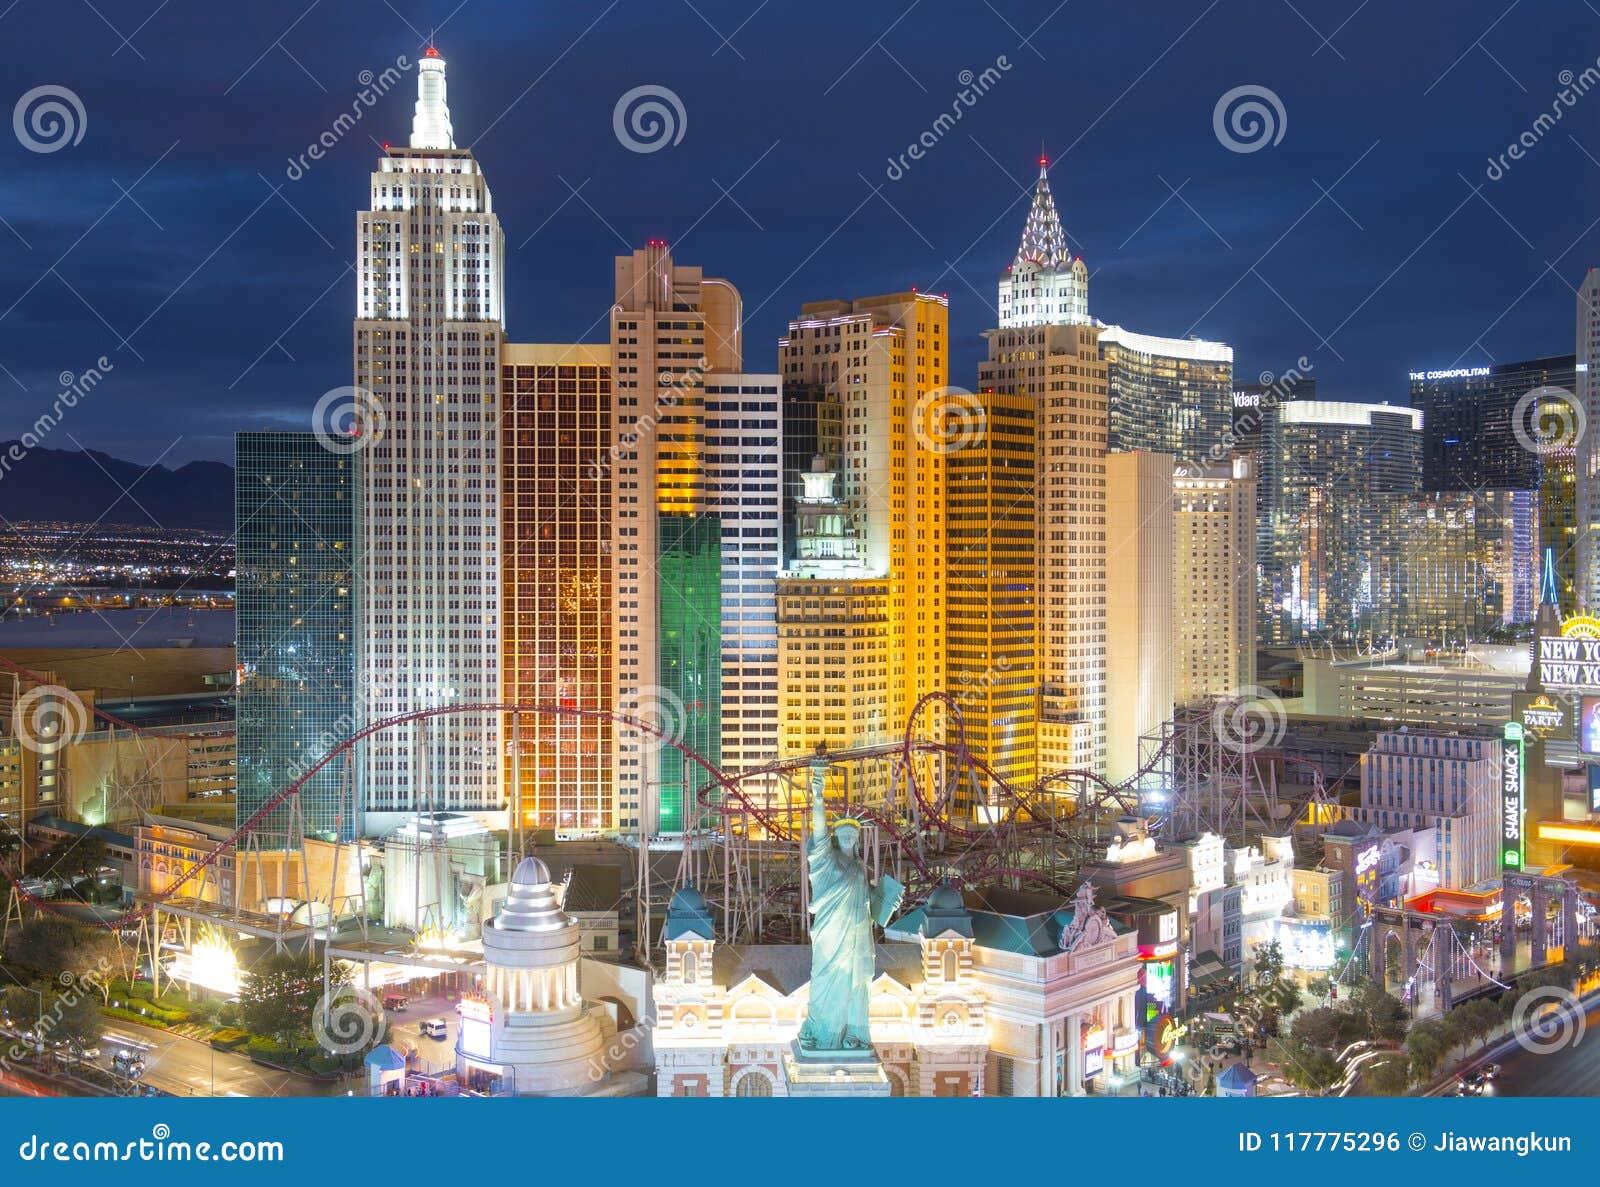 New York New York Hotel And Casino Las Vegas Nv Usa Editorial